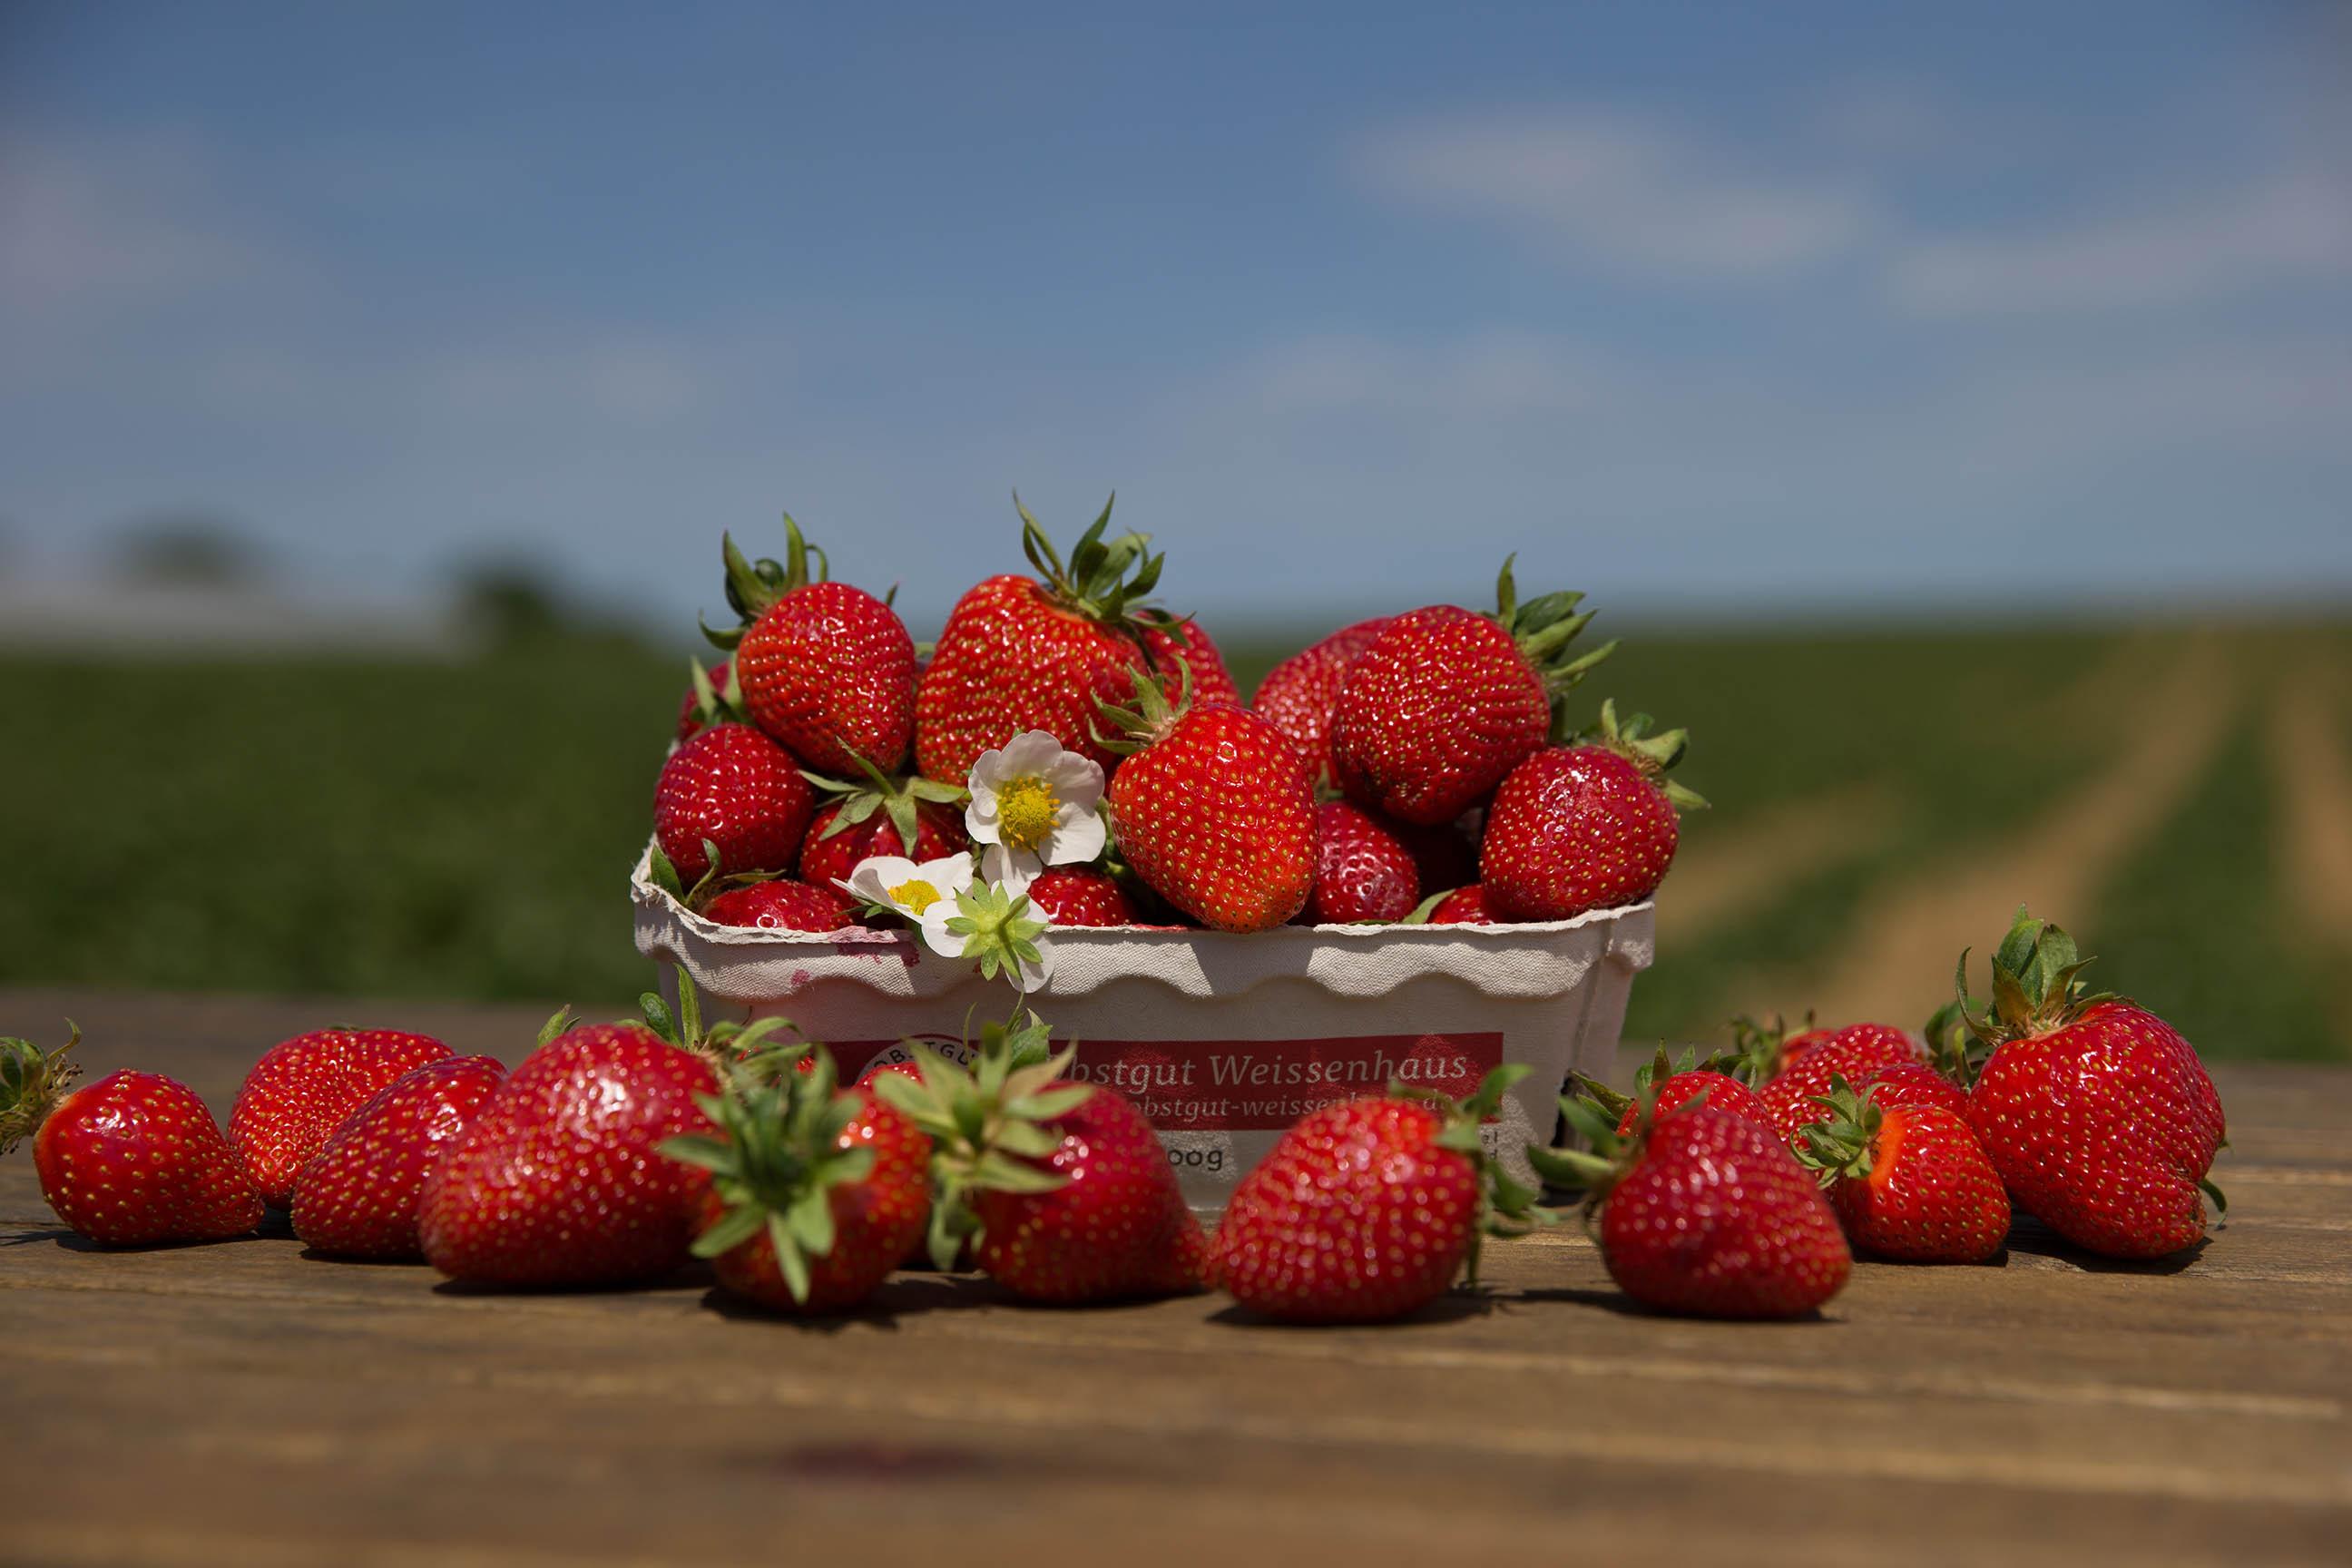 Gut Friederikenhof - Erdbeeren frisch vom Feld